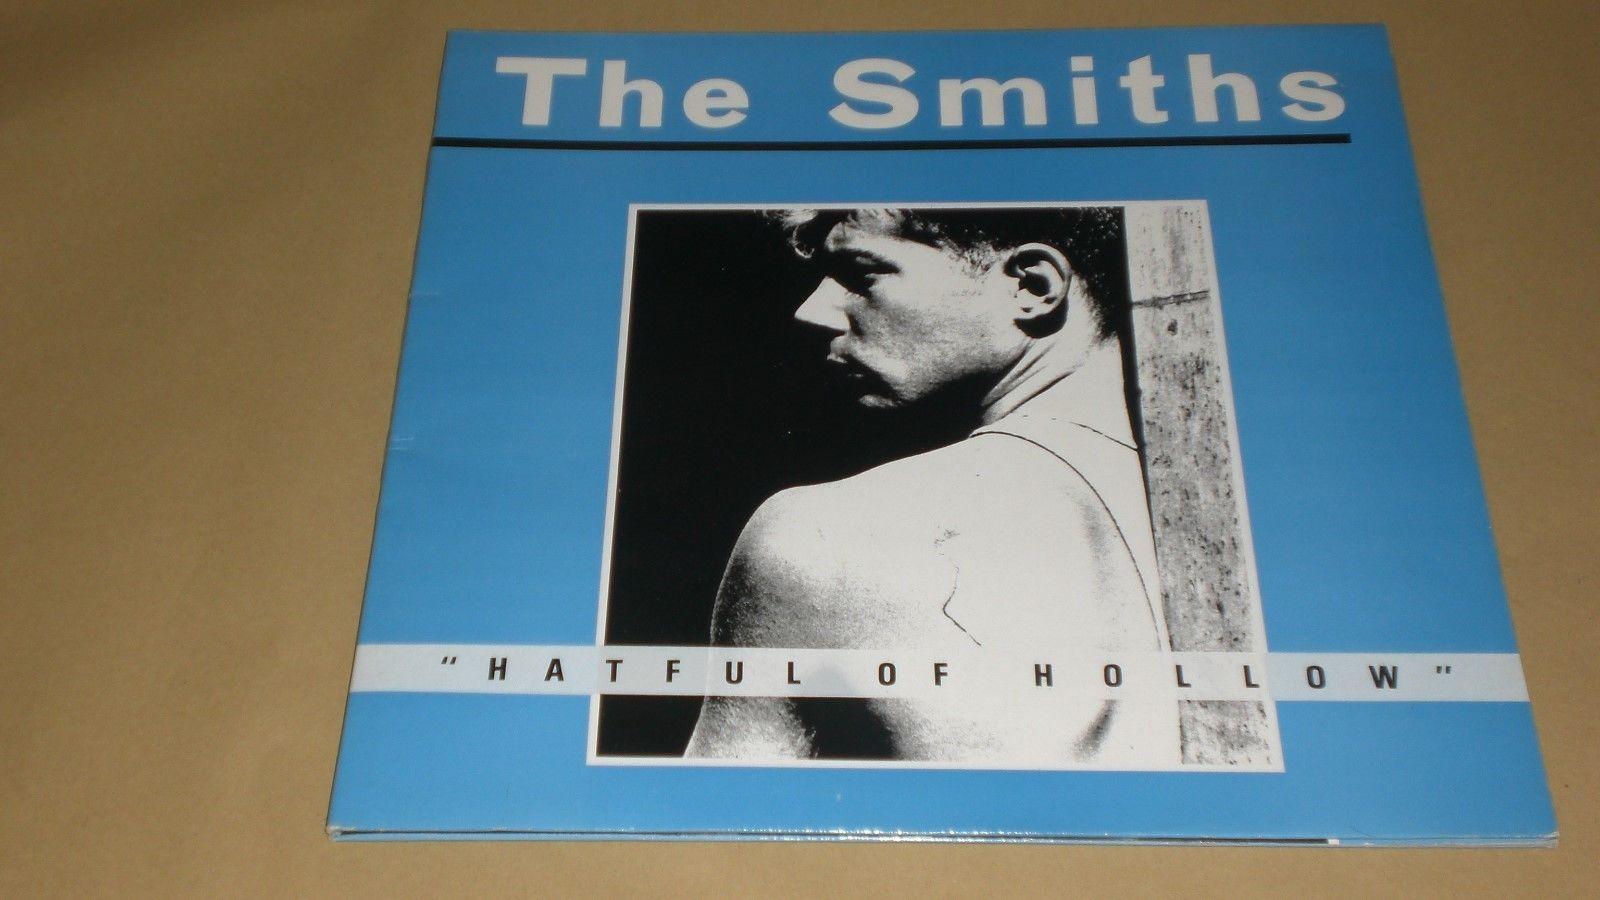 THE SMITHS -HATEFUL OF HOLLOW -VINYL ALBUM -1984 -MATX A1/B3 -ROUGH 76 -V. GOOD